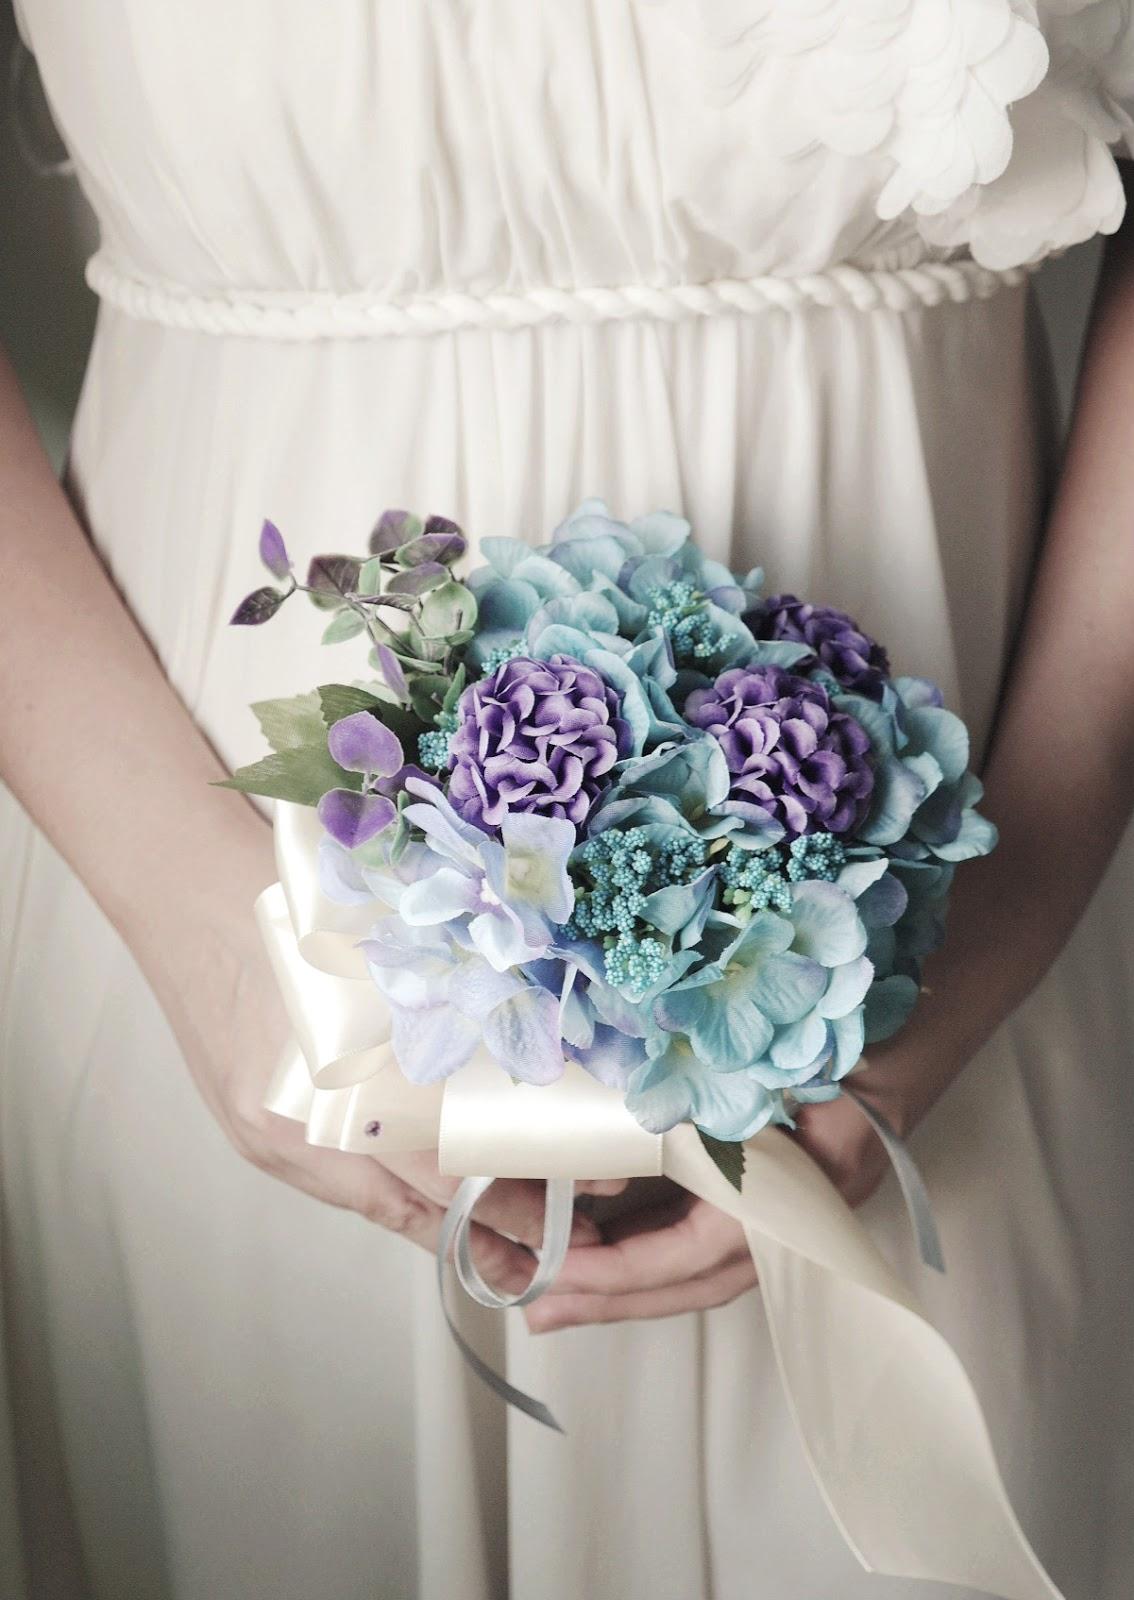 Inakabeads handmade fabric flower accessories wedding corsages handmade flower bouquet izmirmasajfo Image collections